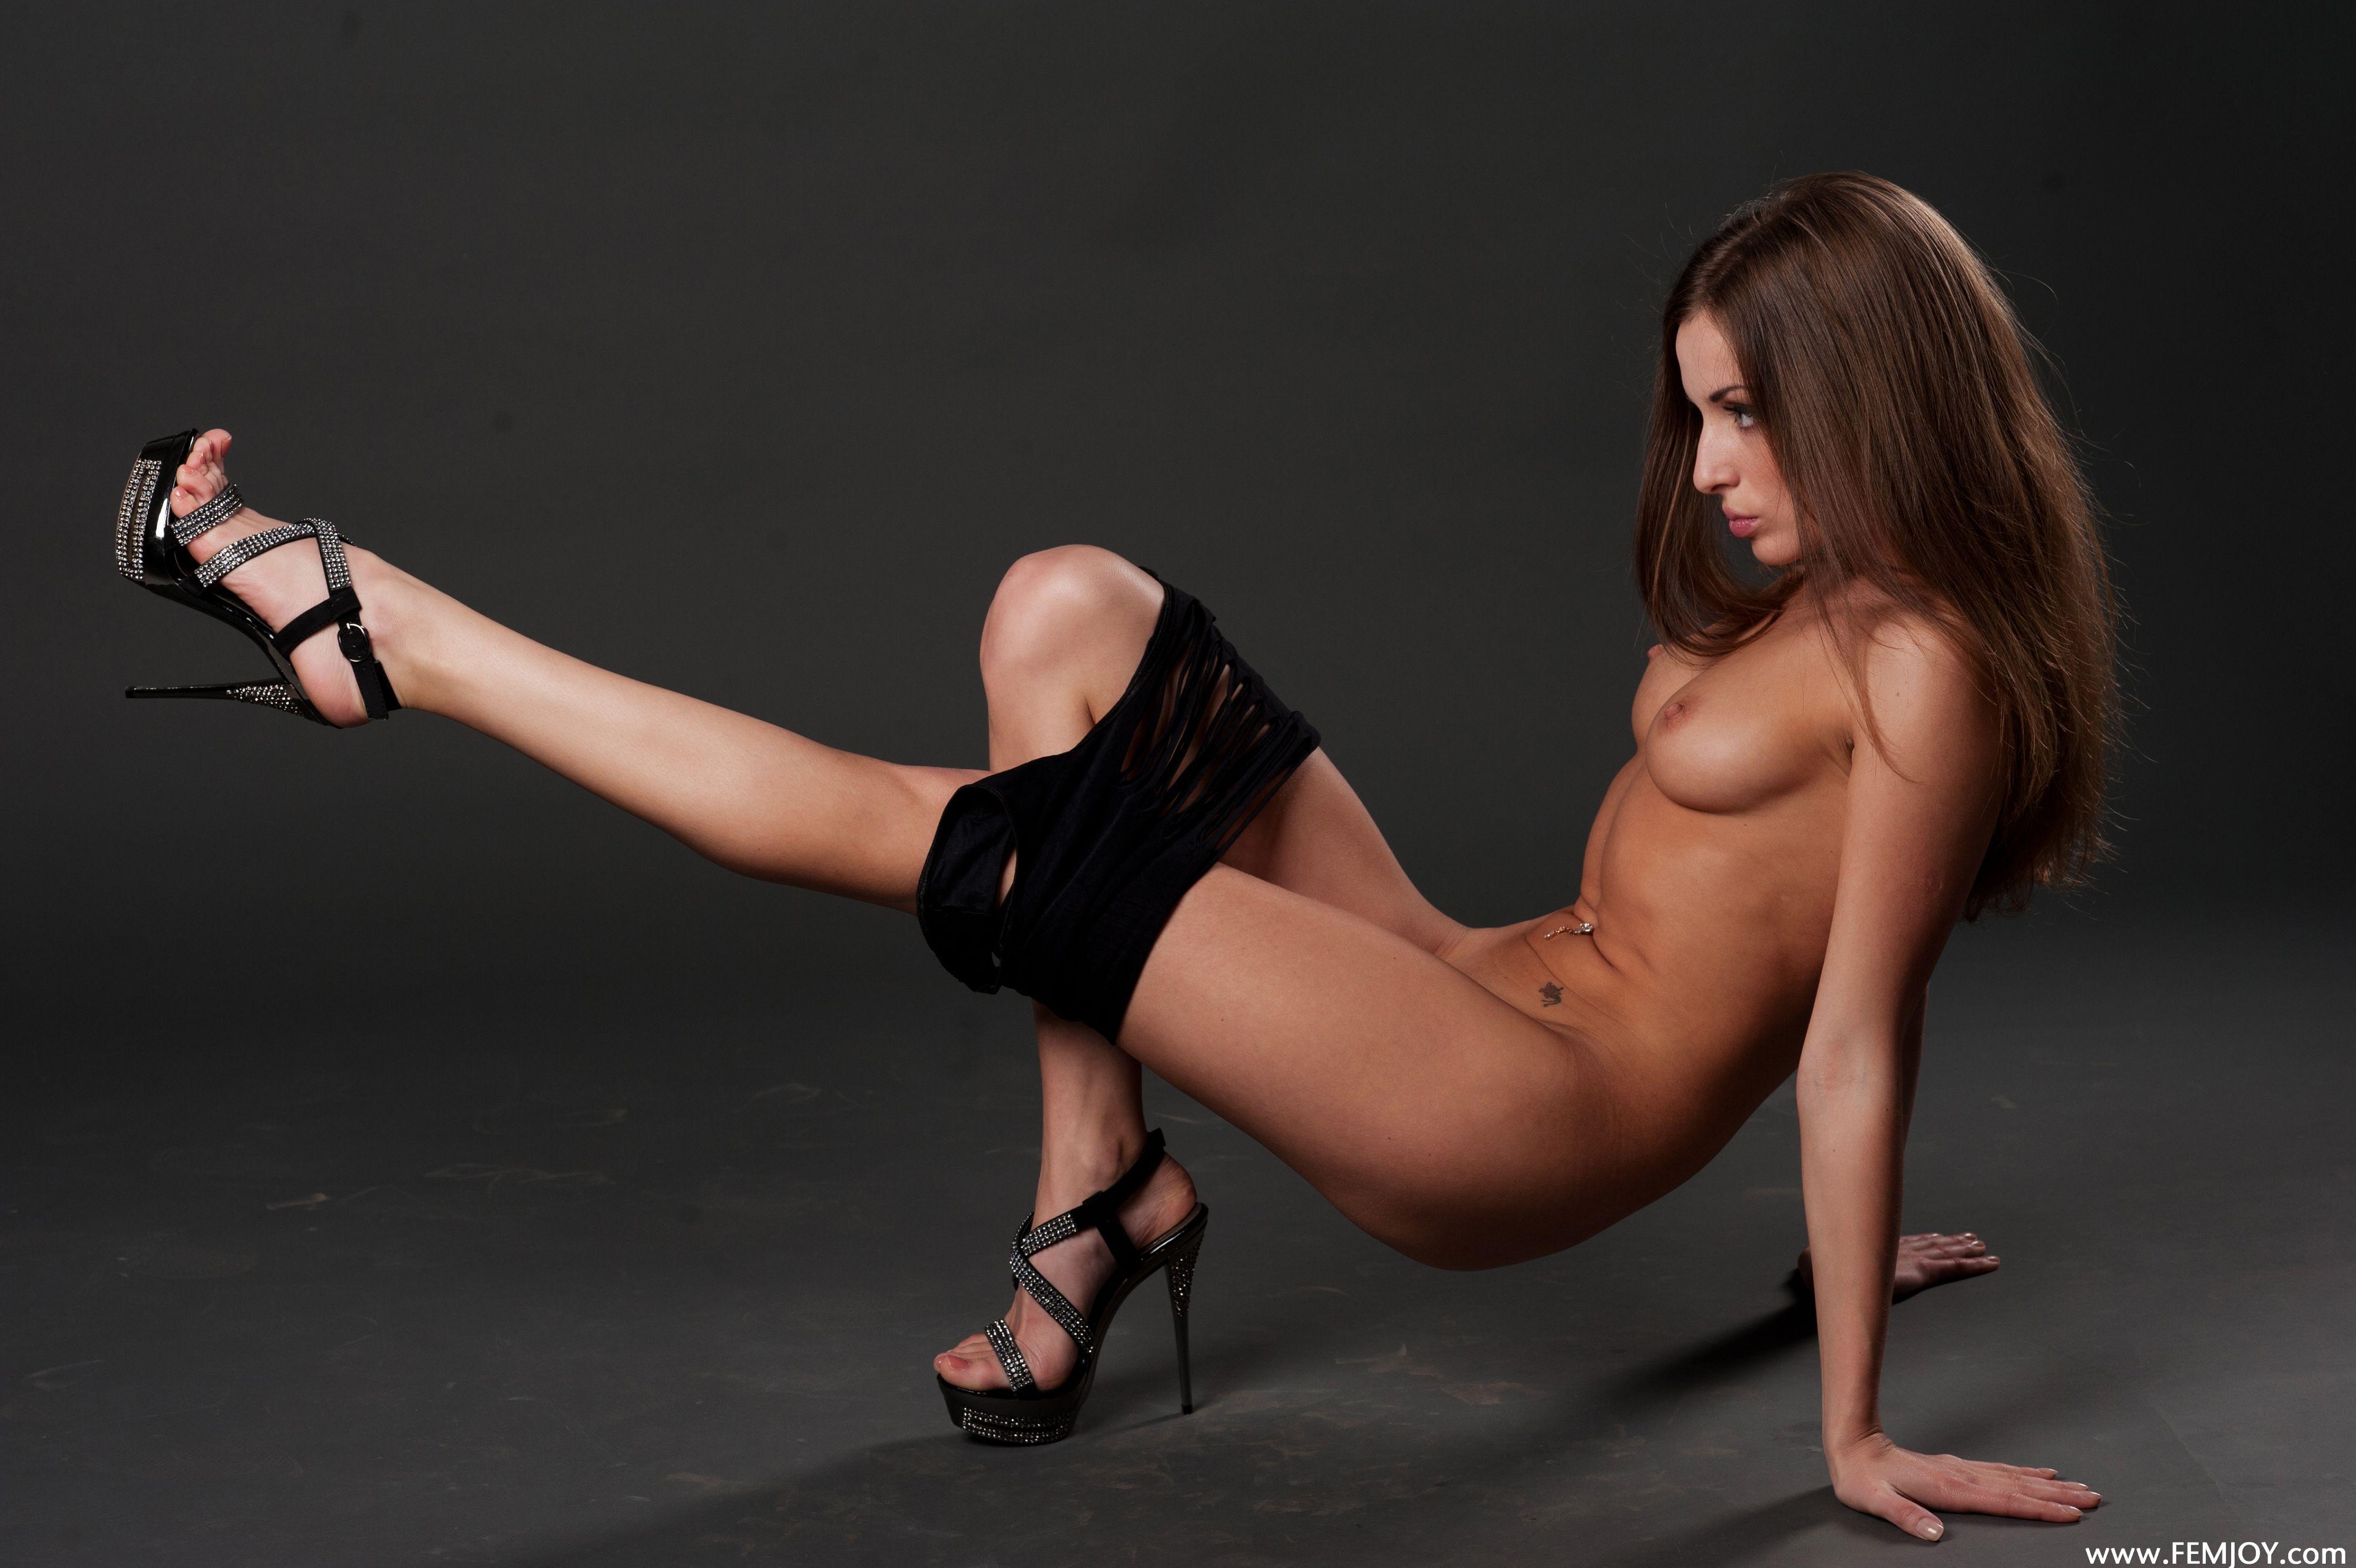 http://i1.imageban.ru/out/2013/10/27/abea4ac0d7c07157c7426e8a792b9112.jpg